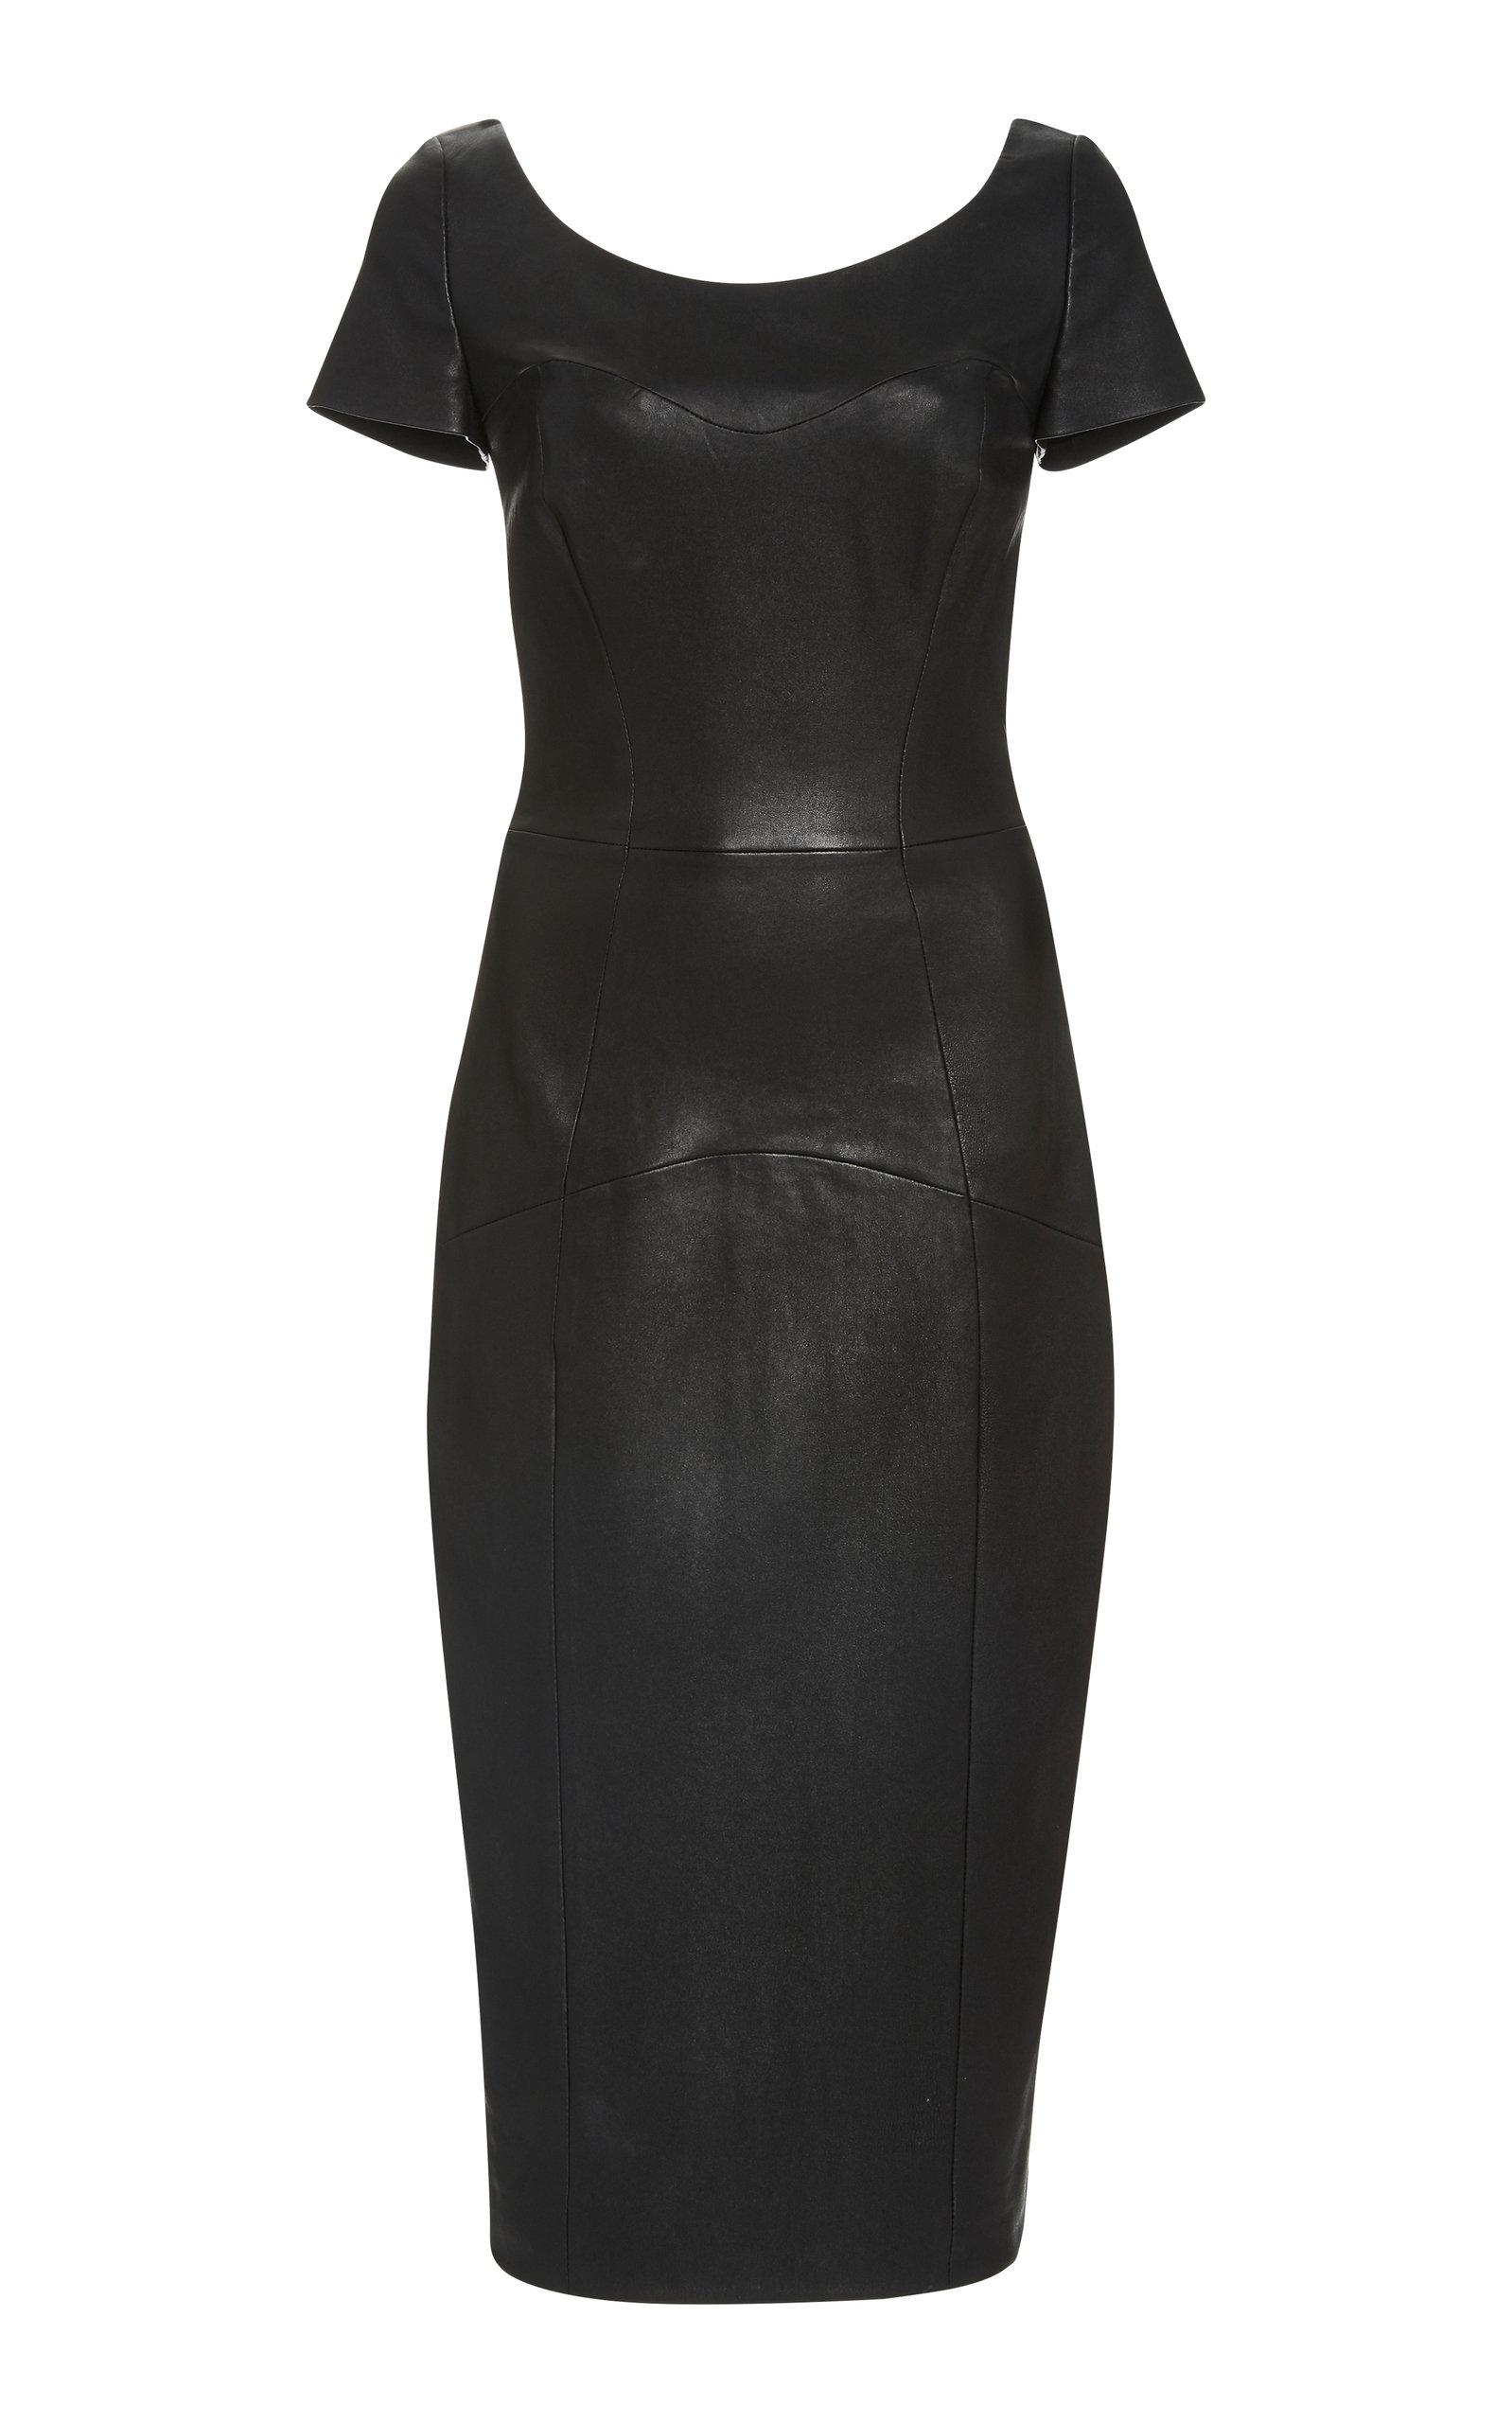 Buy Lena Hoschek Pleasure Leather Midi Dress online, shop Lena Hoschek at the best price